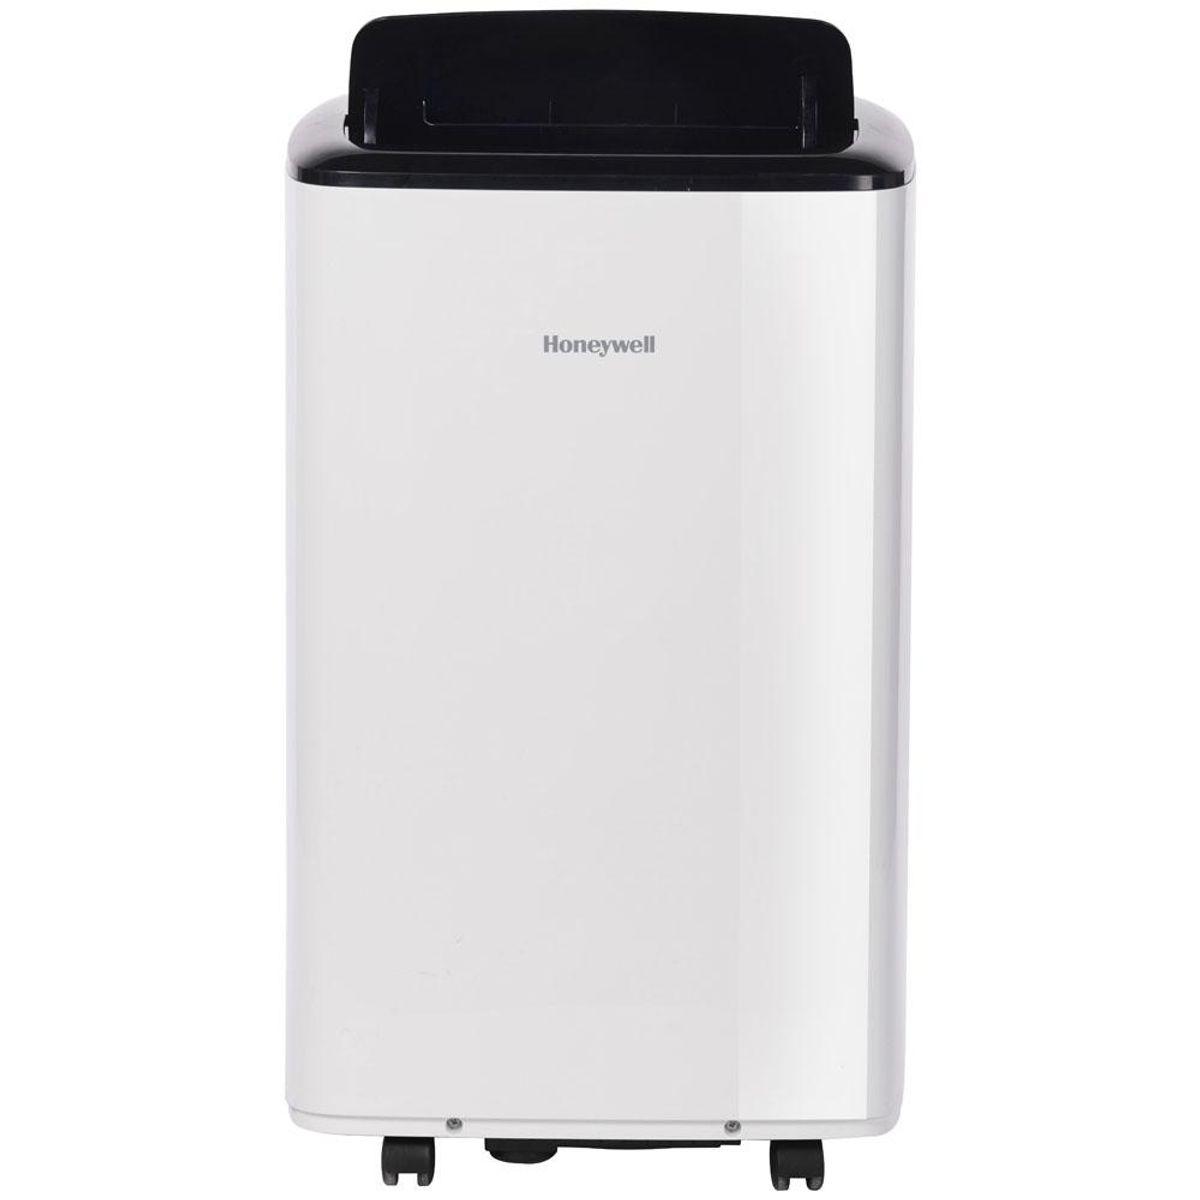 honeywell 8000 btu portable air conditioner dehumidifier and fan